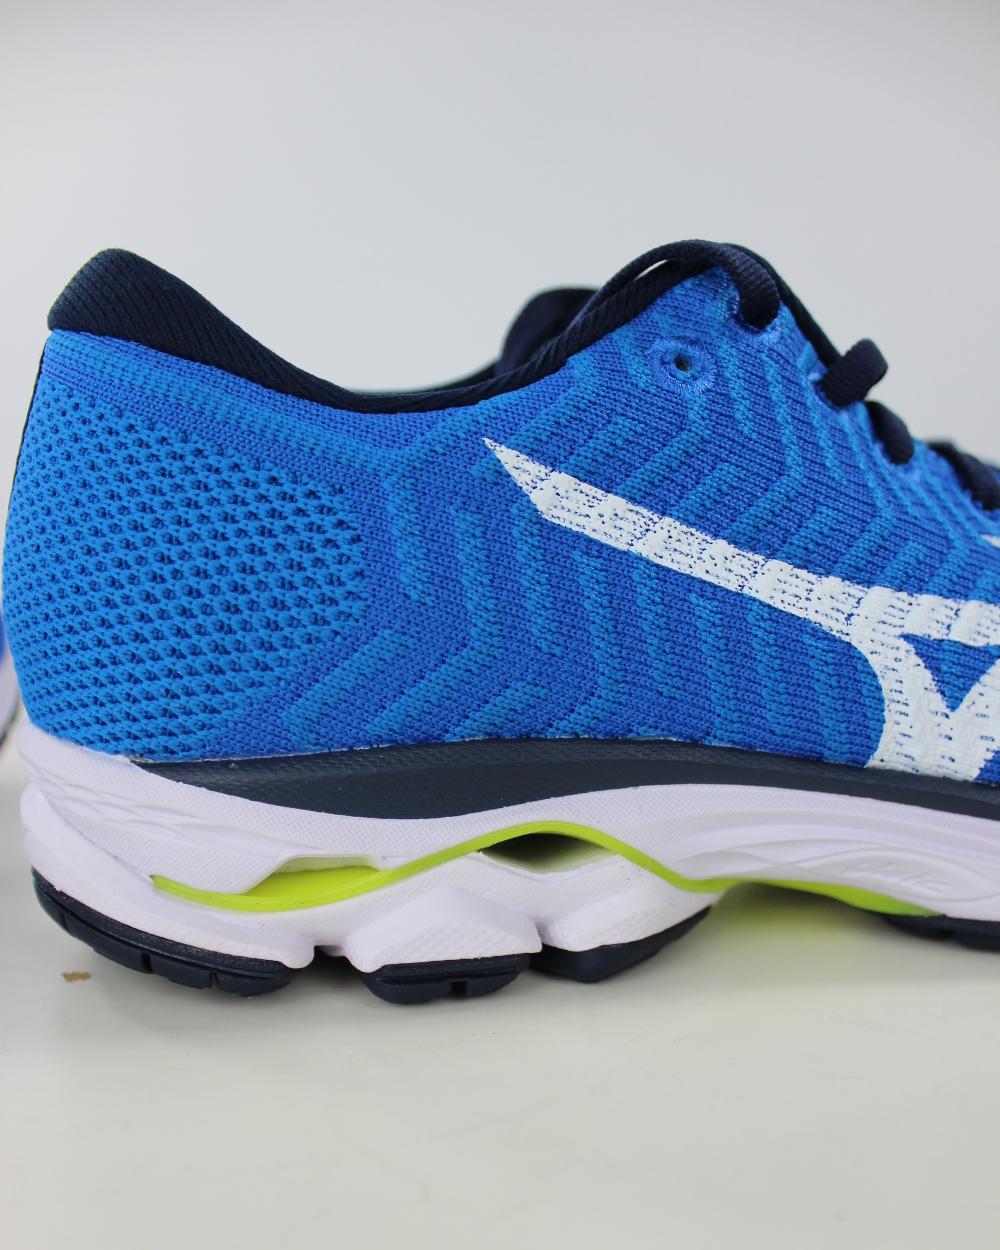 Mizuno Laufschuhe running Schuhe Turnschuhe Ausbilder WAVEKNITR1 blau Herren